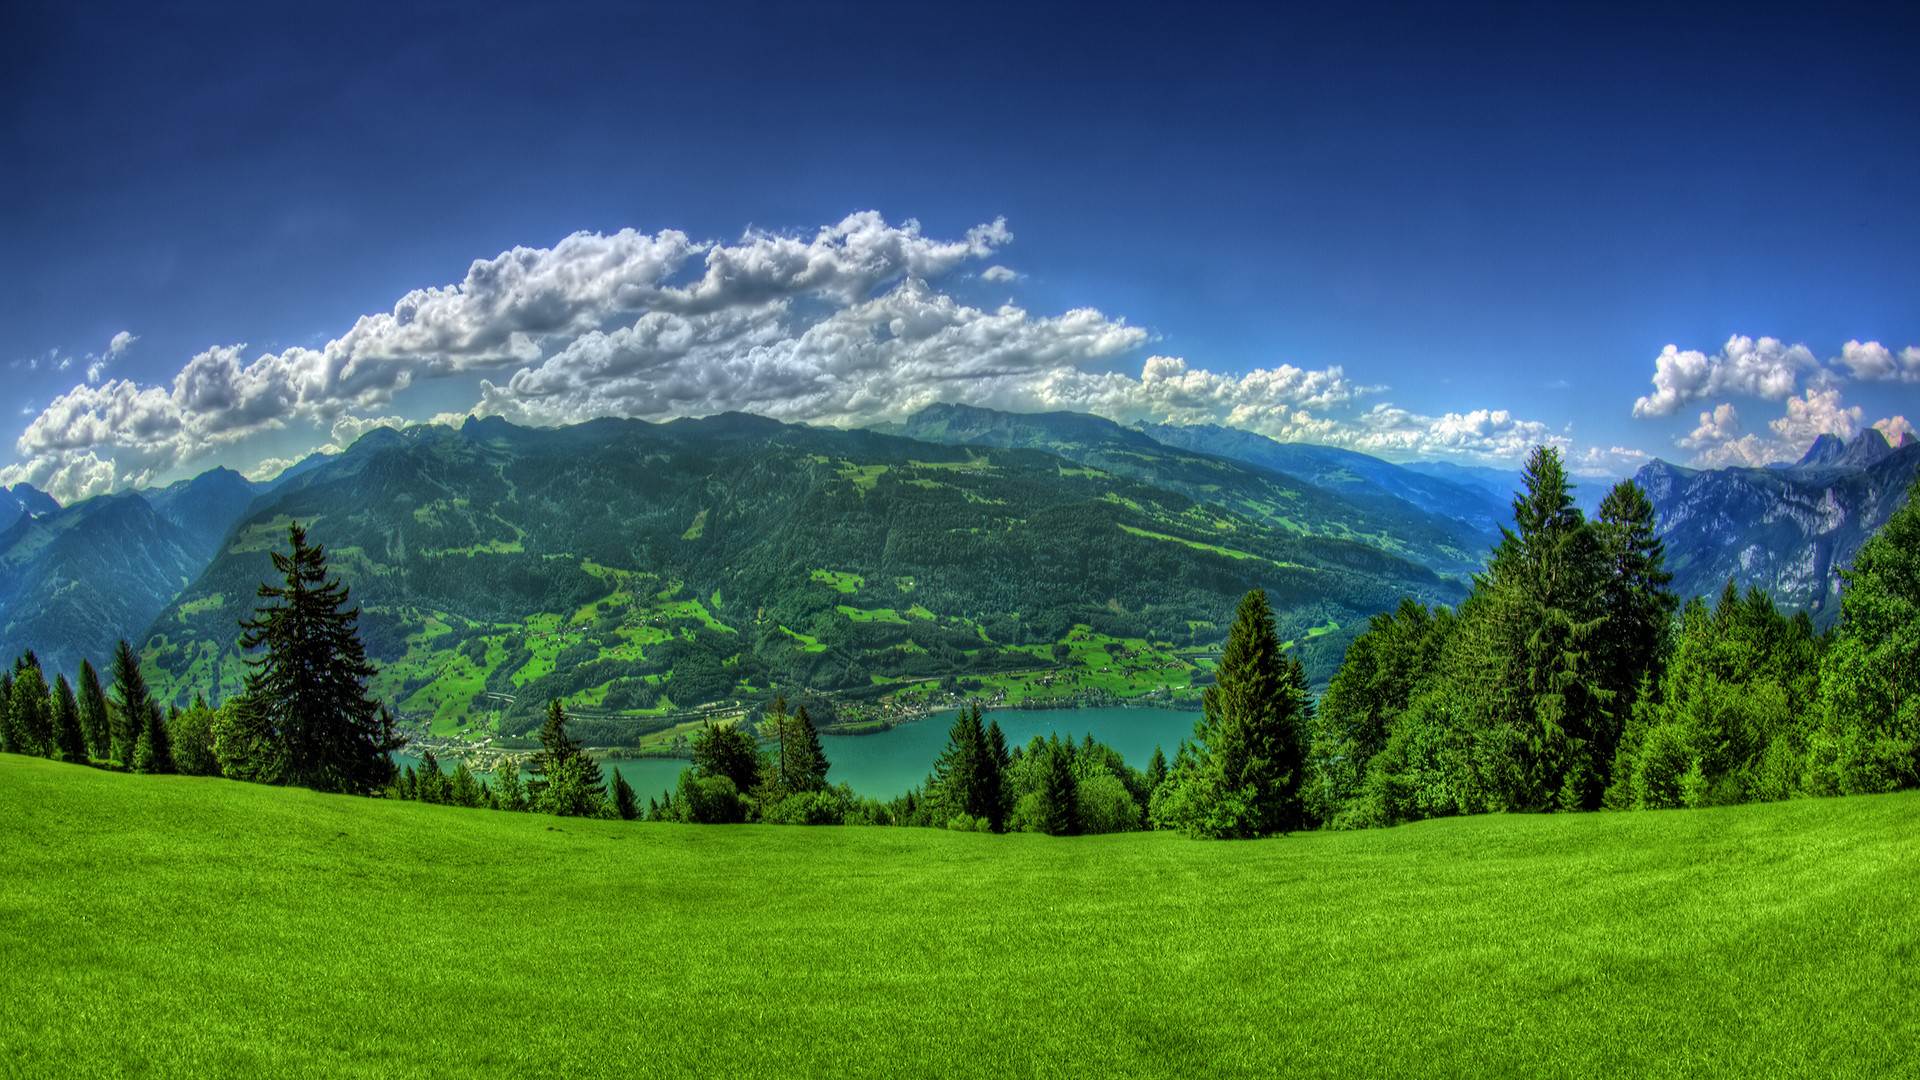 More Beautiful Nature HD Wallpaper FLgrx Graphics 1920x1080